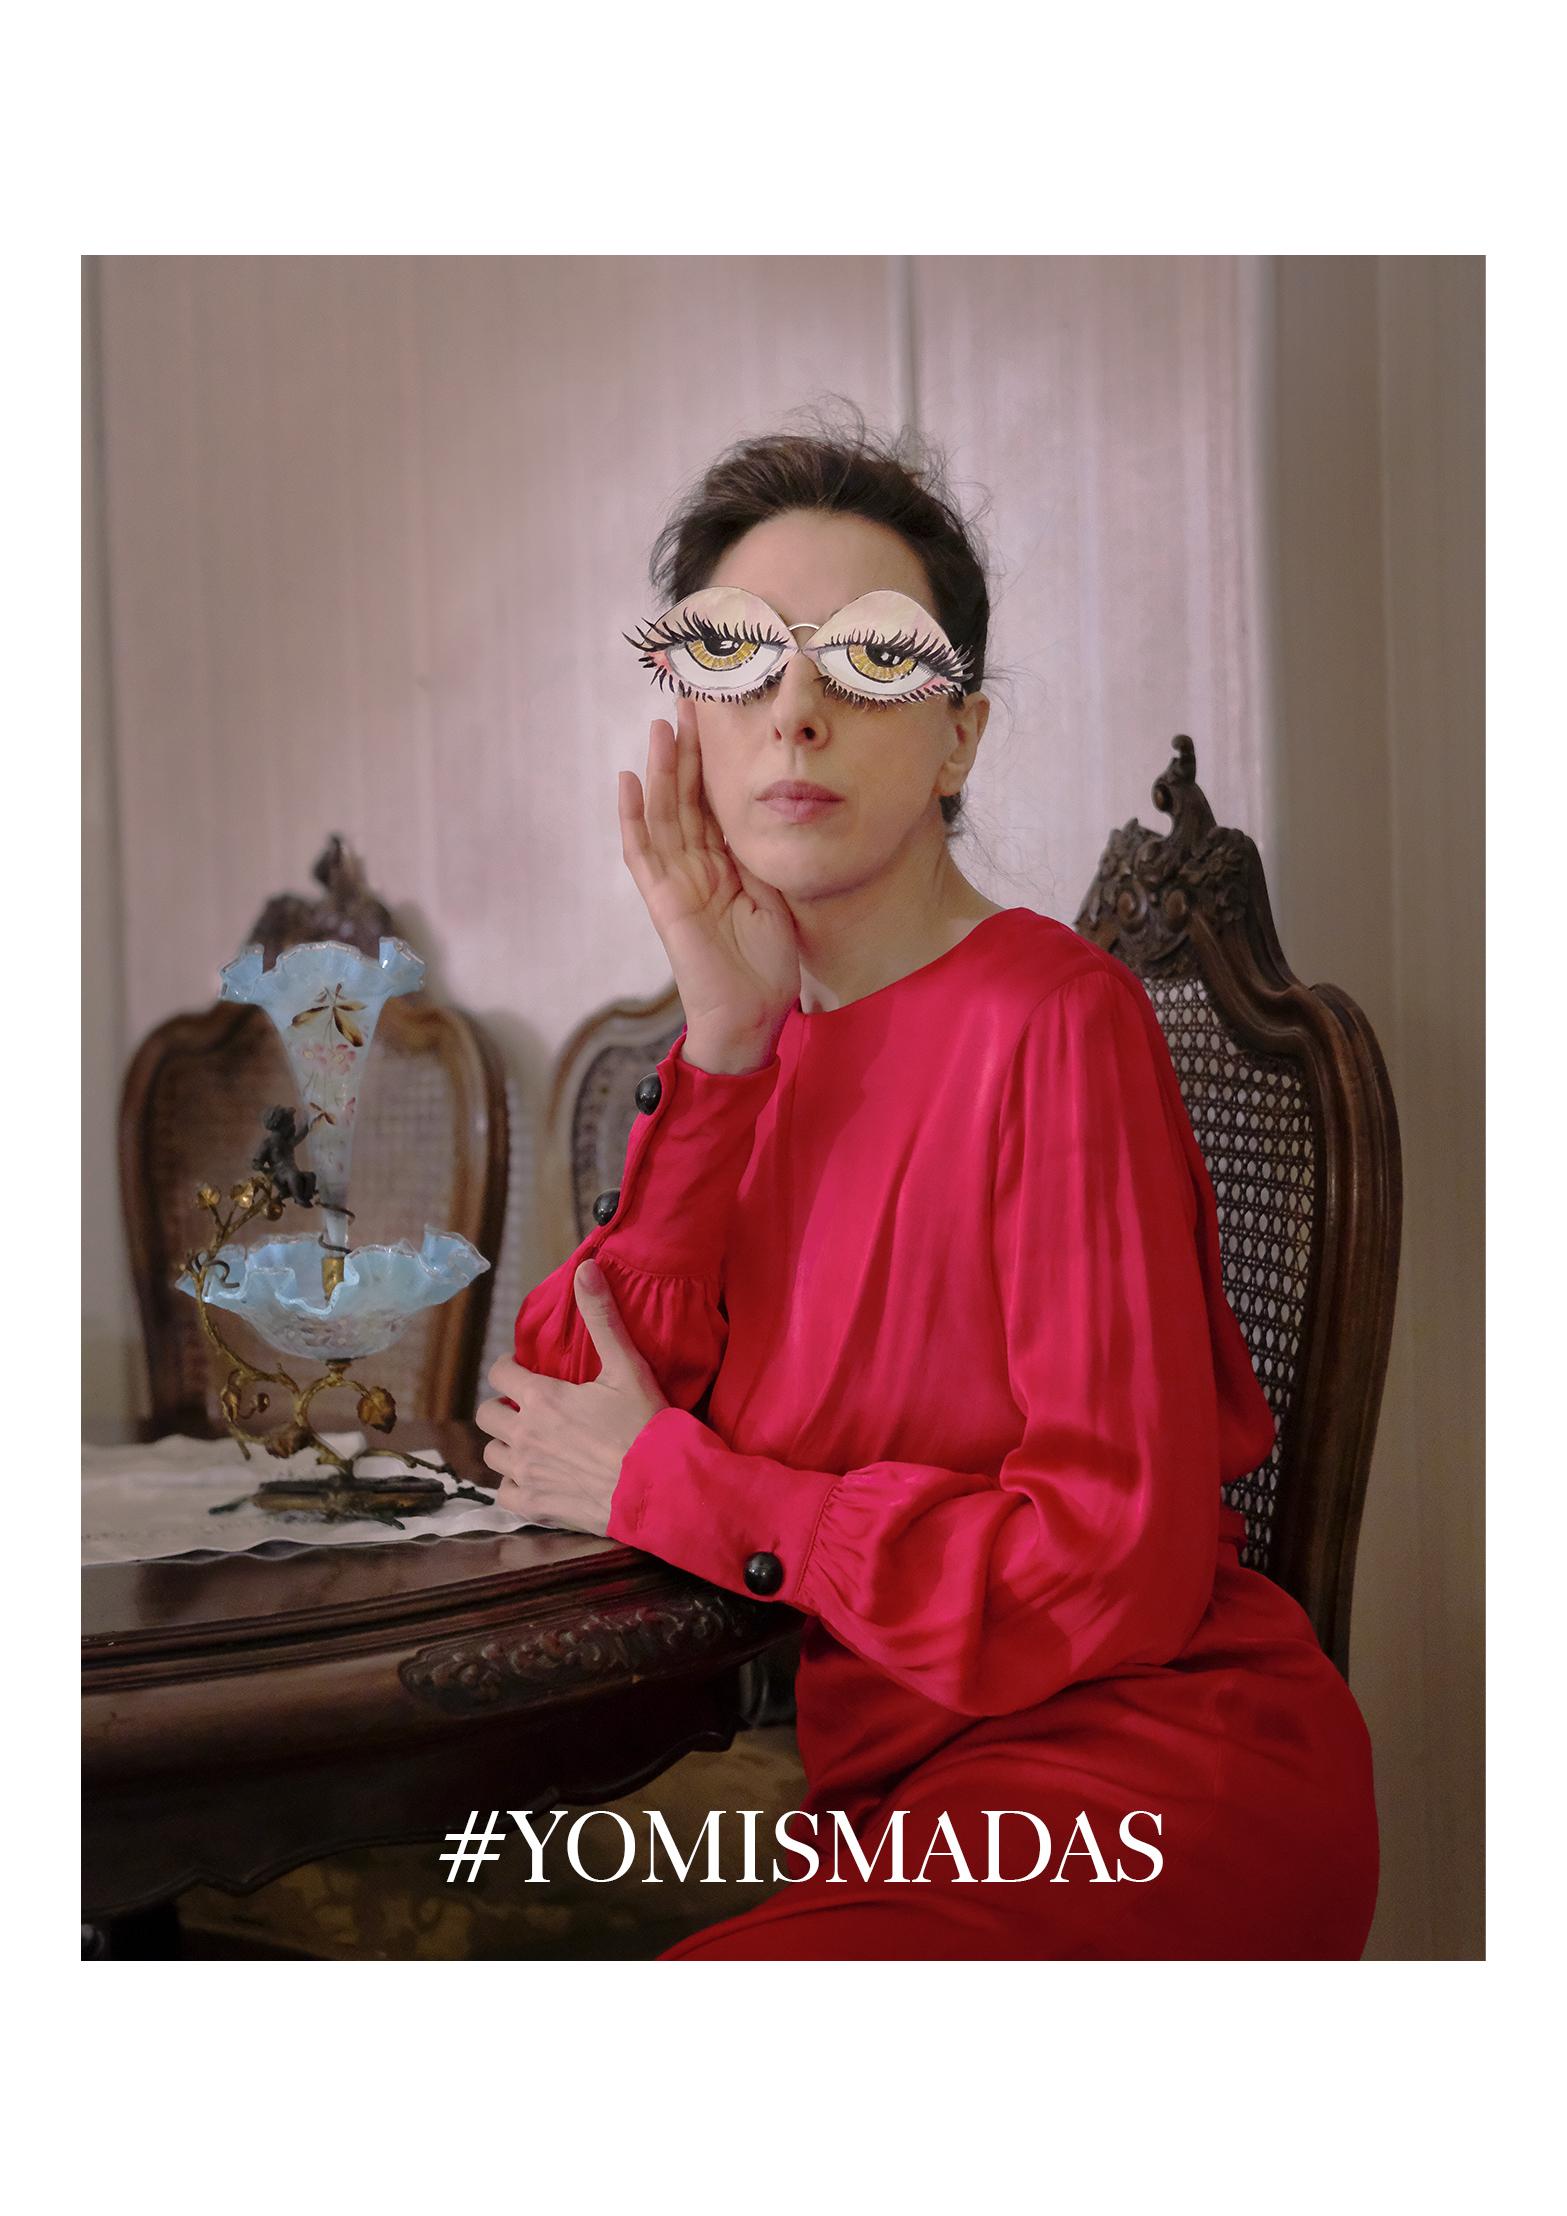 Crazy Lady in red- Yomismadas